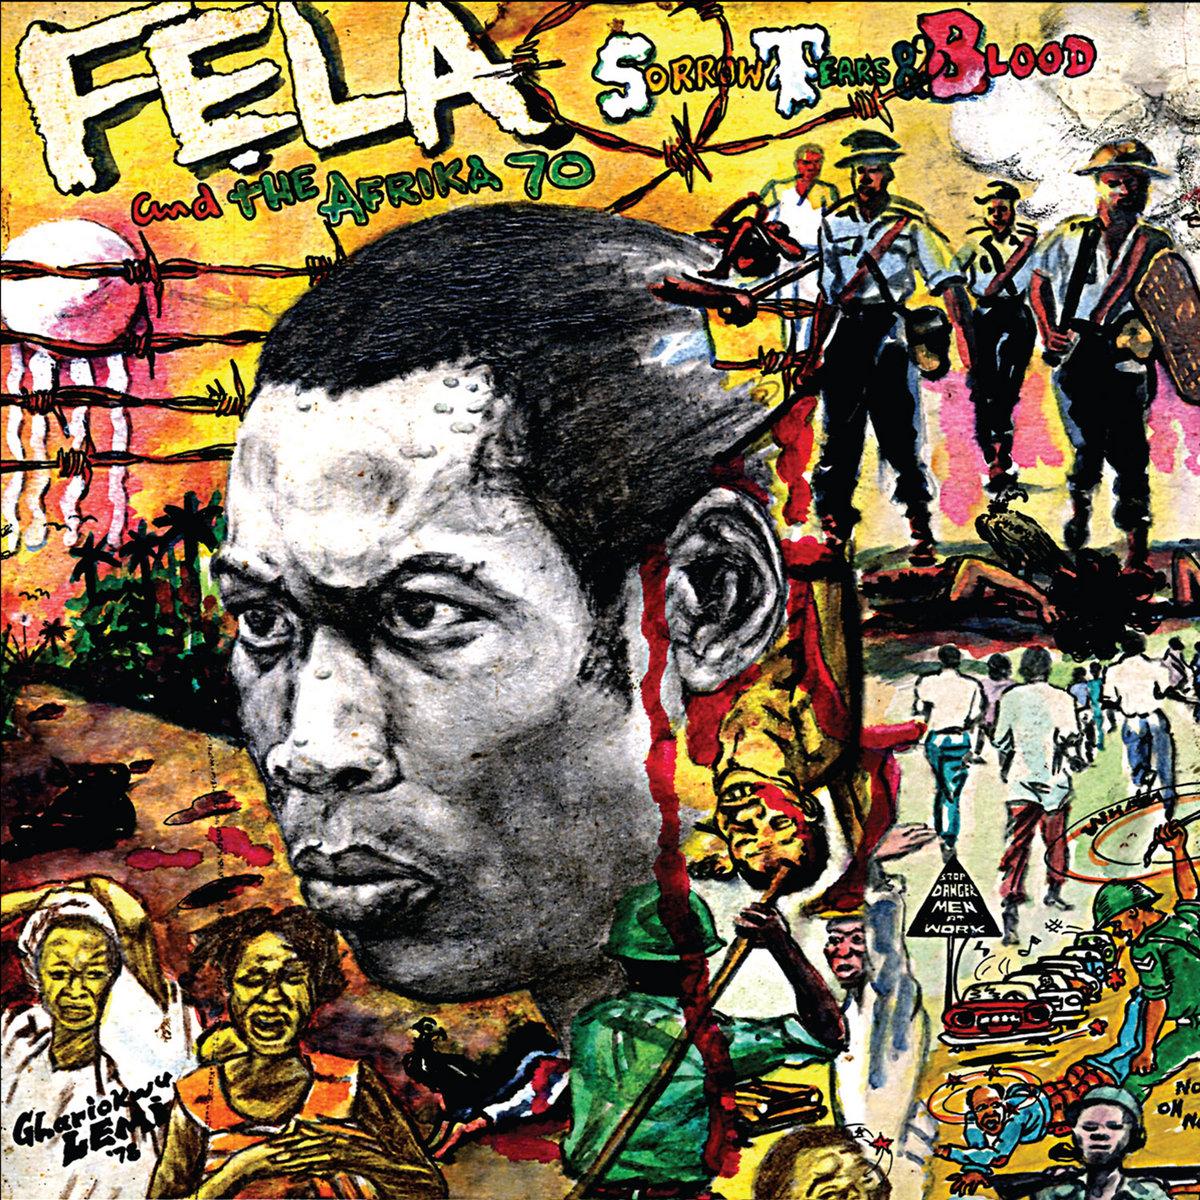 Sorrow, Tears & Blood (1977) | Fela Kuti